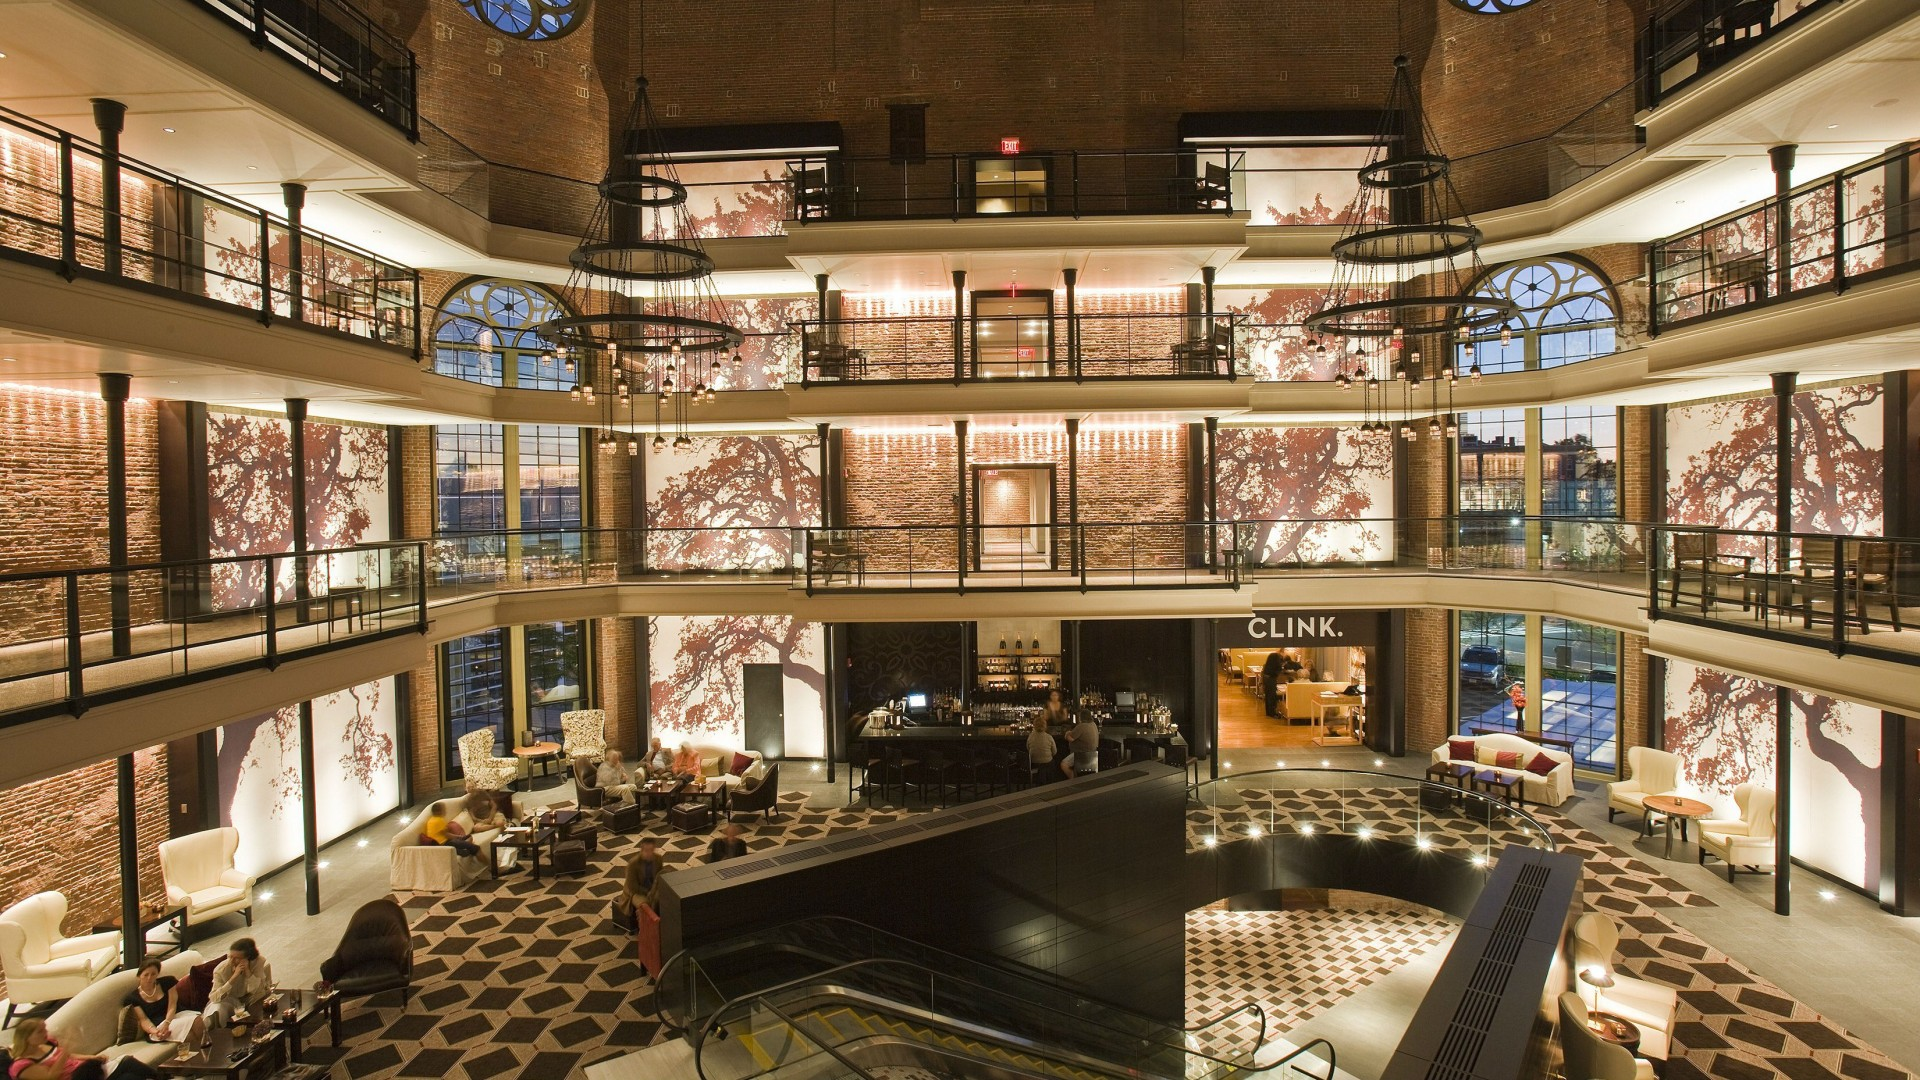 The Liberty Hotel, Massachusetts